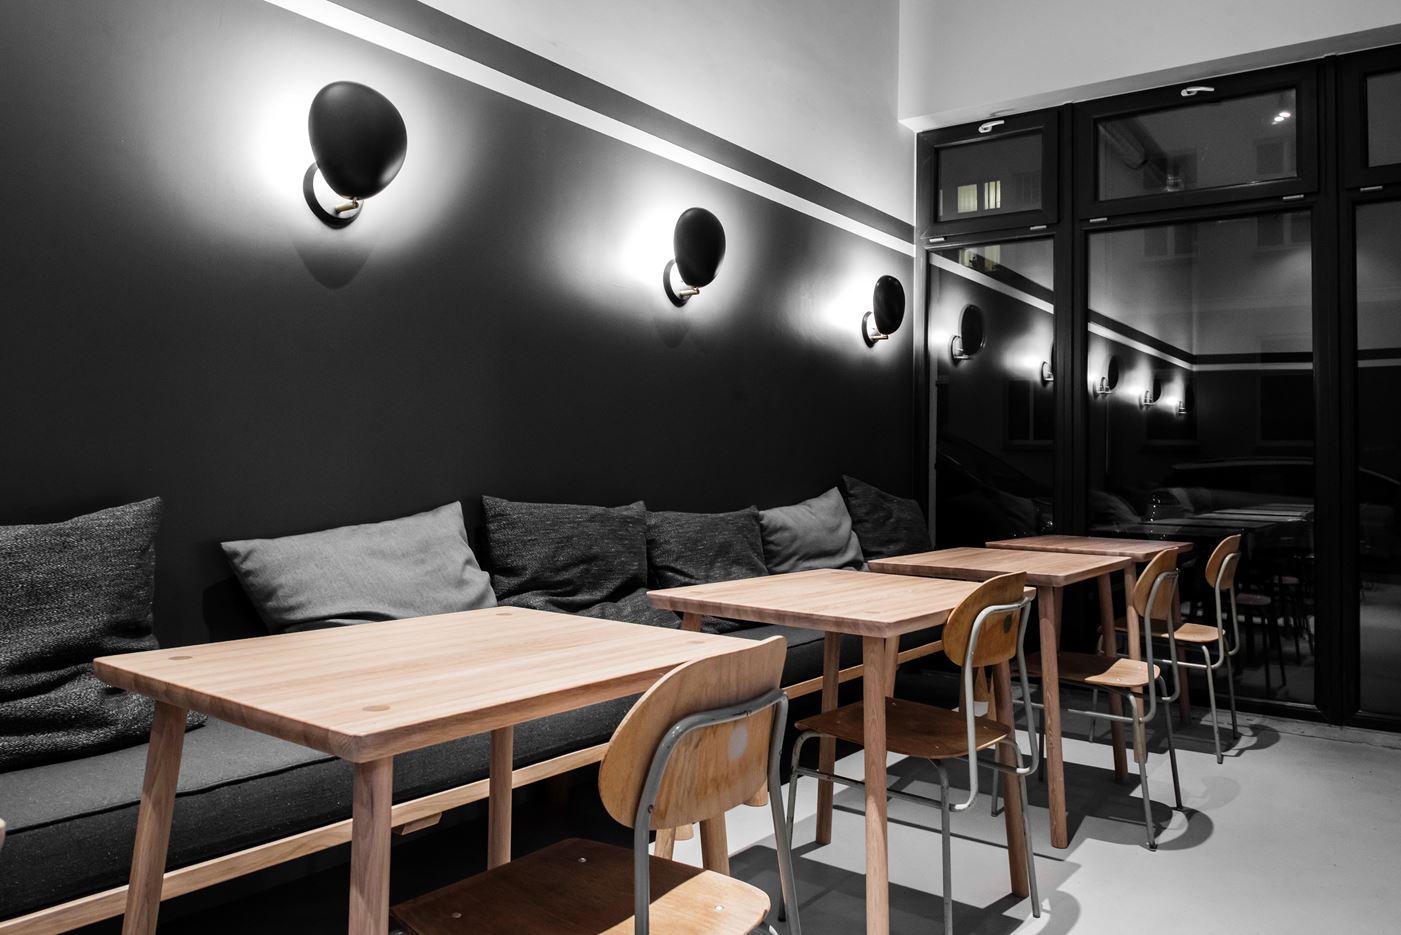 kontrast restaurant in koszalin poland by loft szczecin. Black Bedroom Furniture Sets. Home Design Ideas